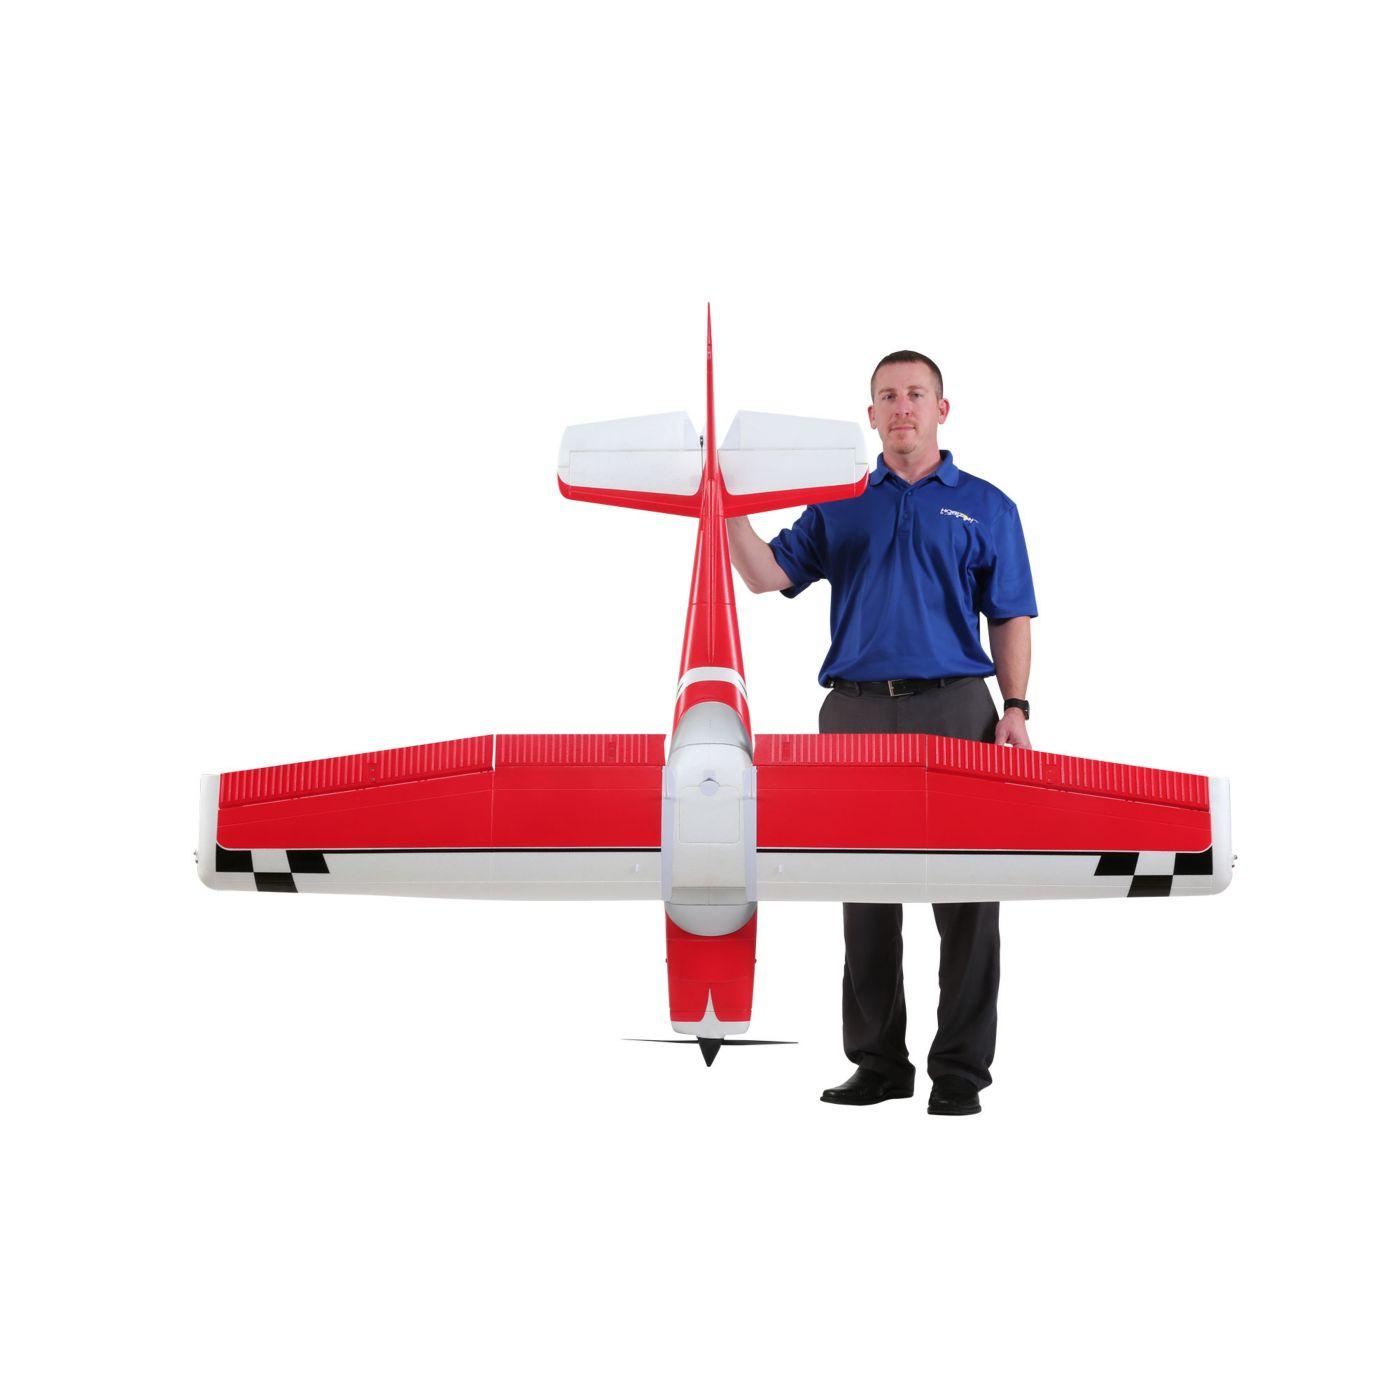 E-flite Carbon Z Cessna 150 2.1m BNF Basic 03